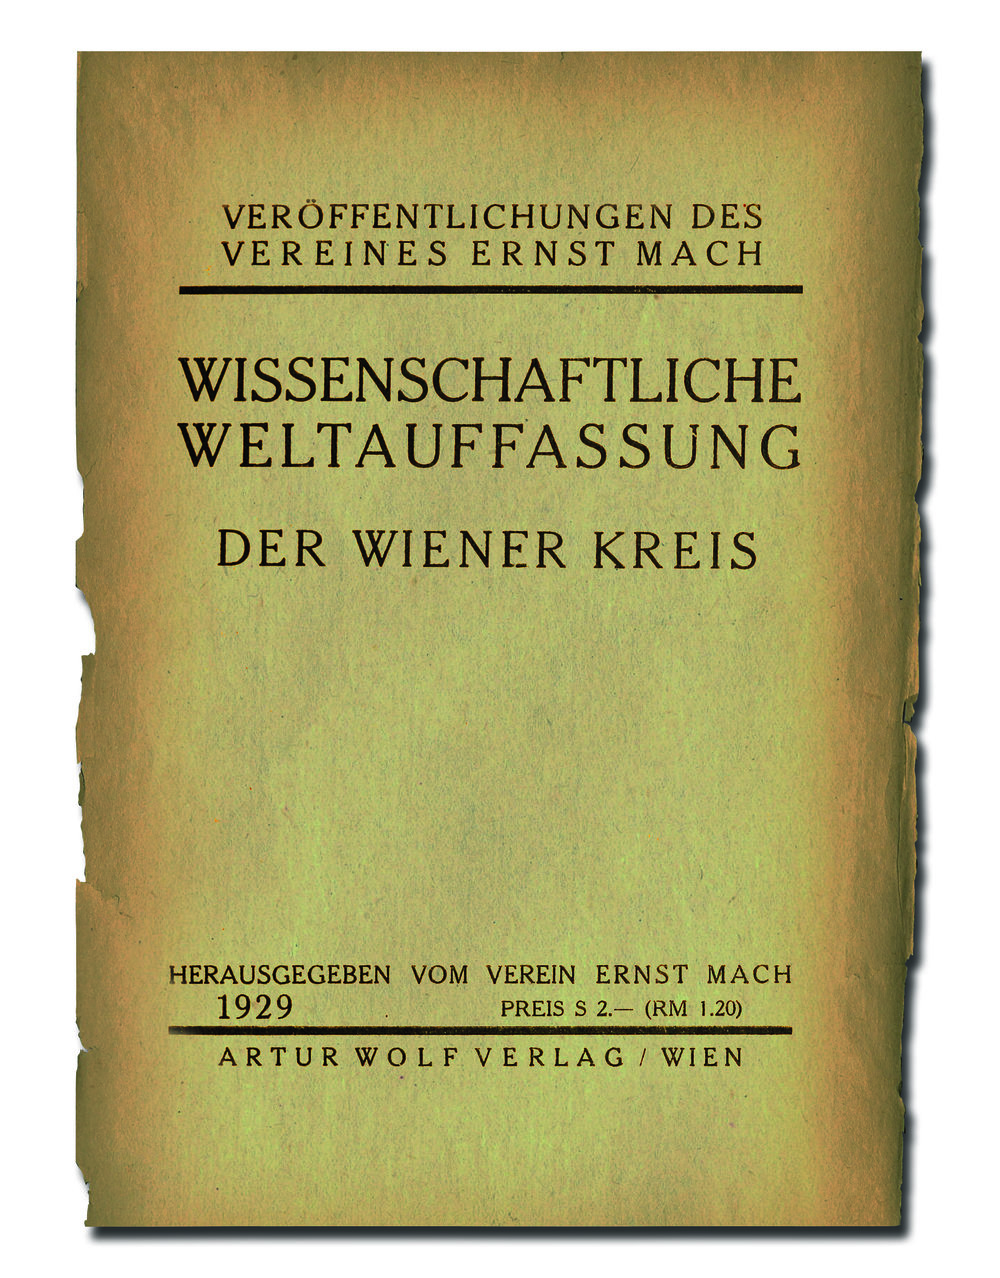 Wiener_Kreis_erstmals_im_Druck.jpg